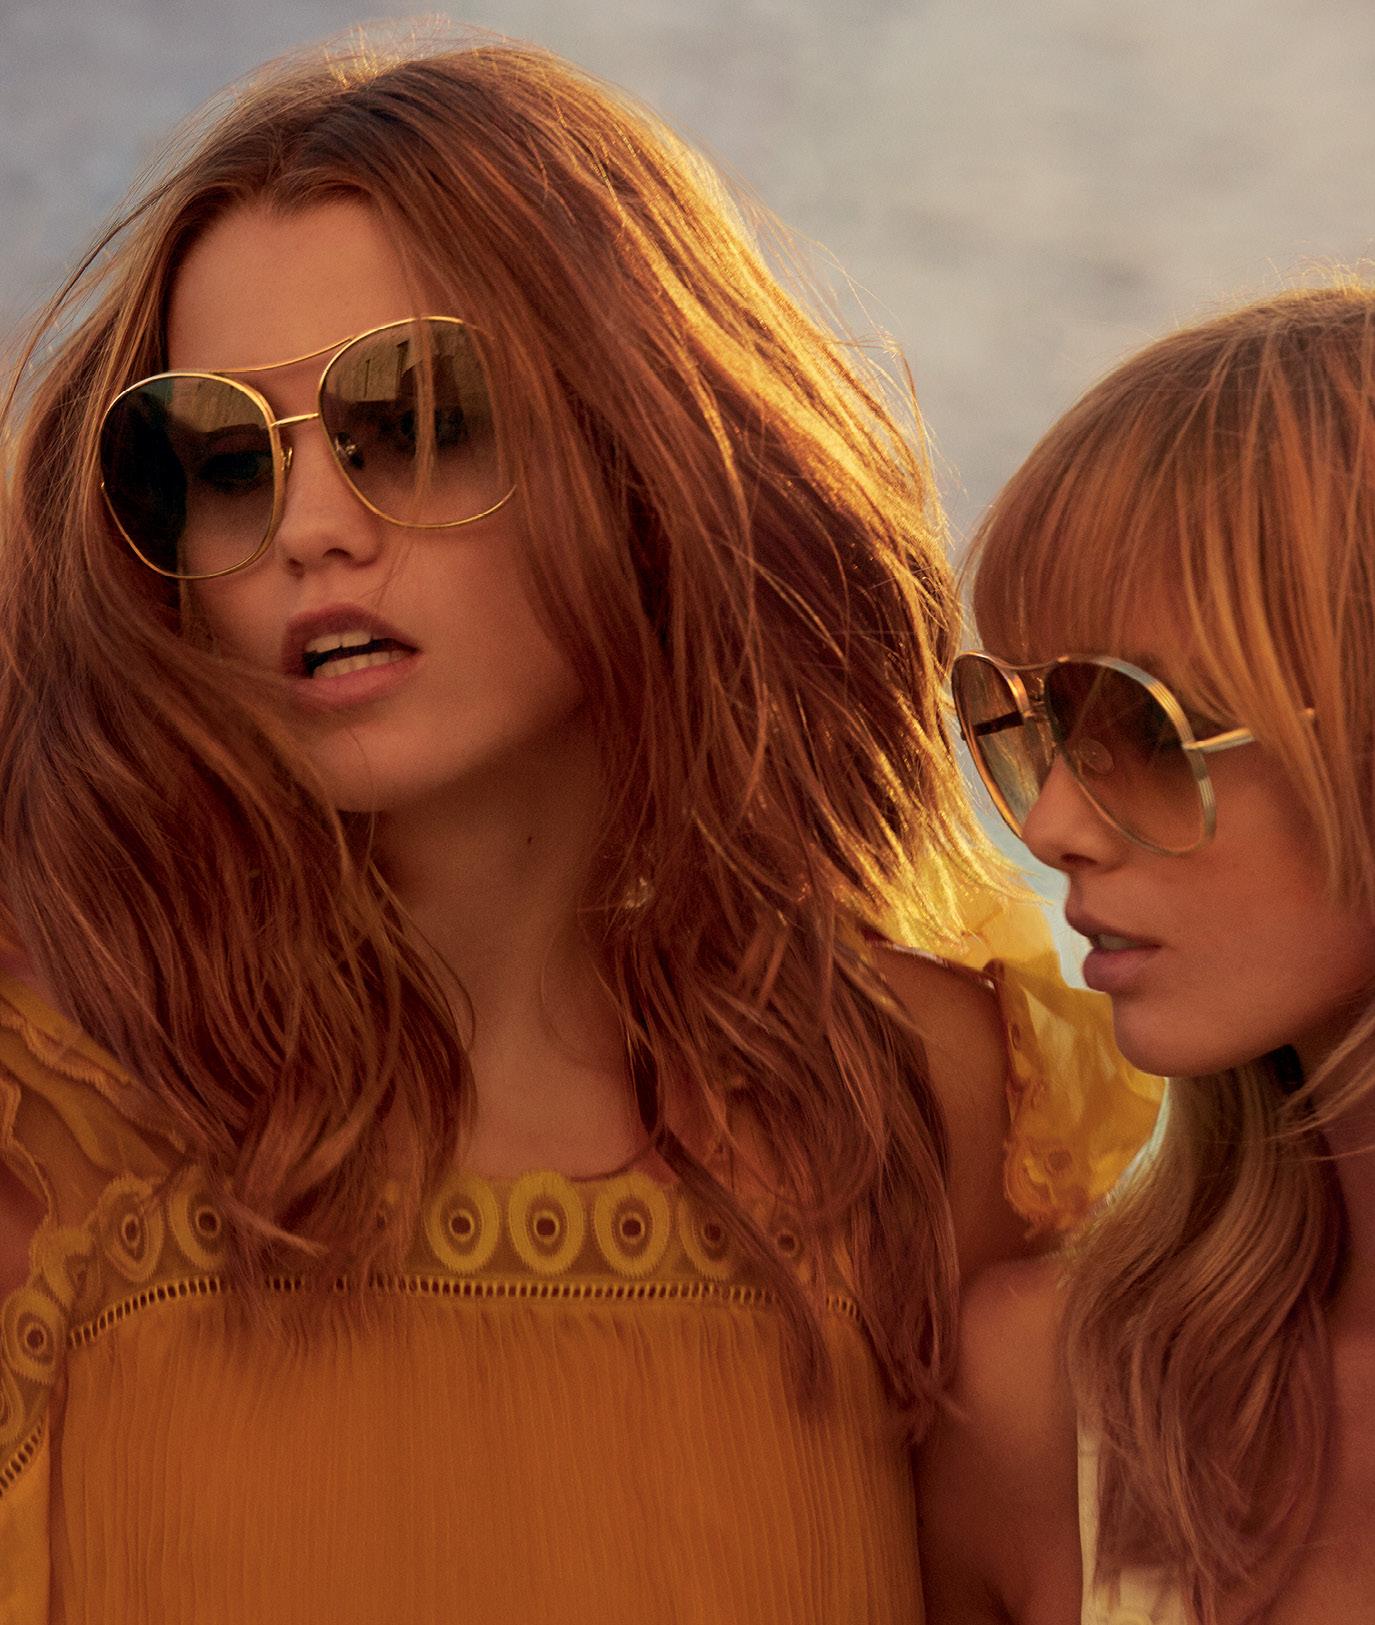 Chloé Sonnenbrillen bei Mister Spex